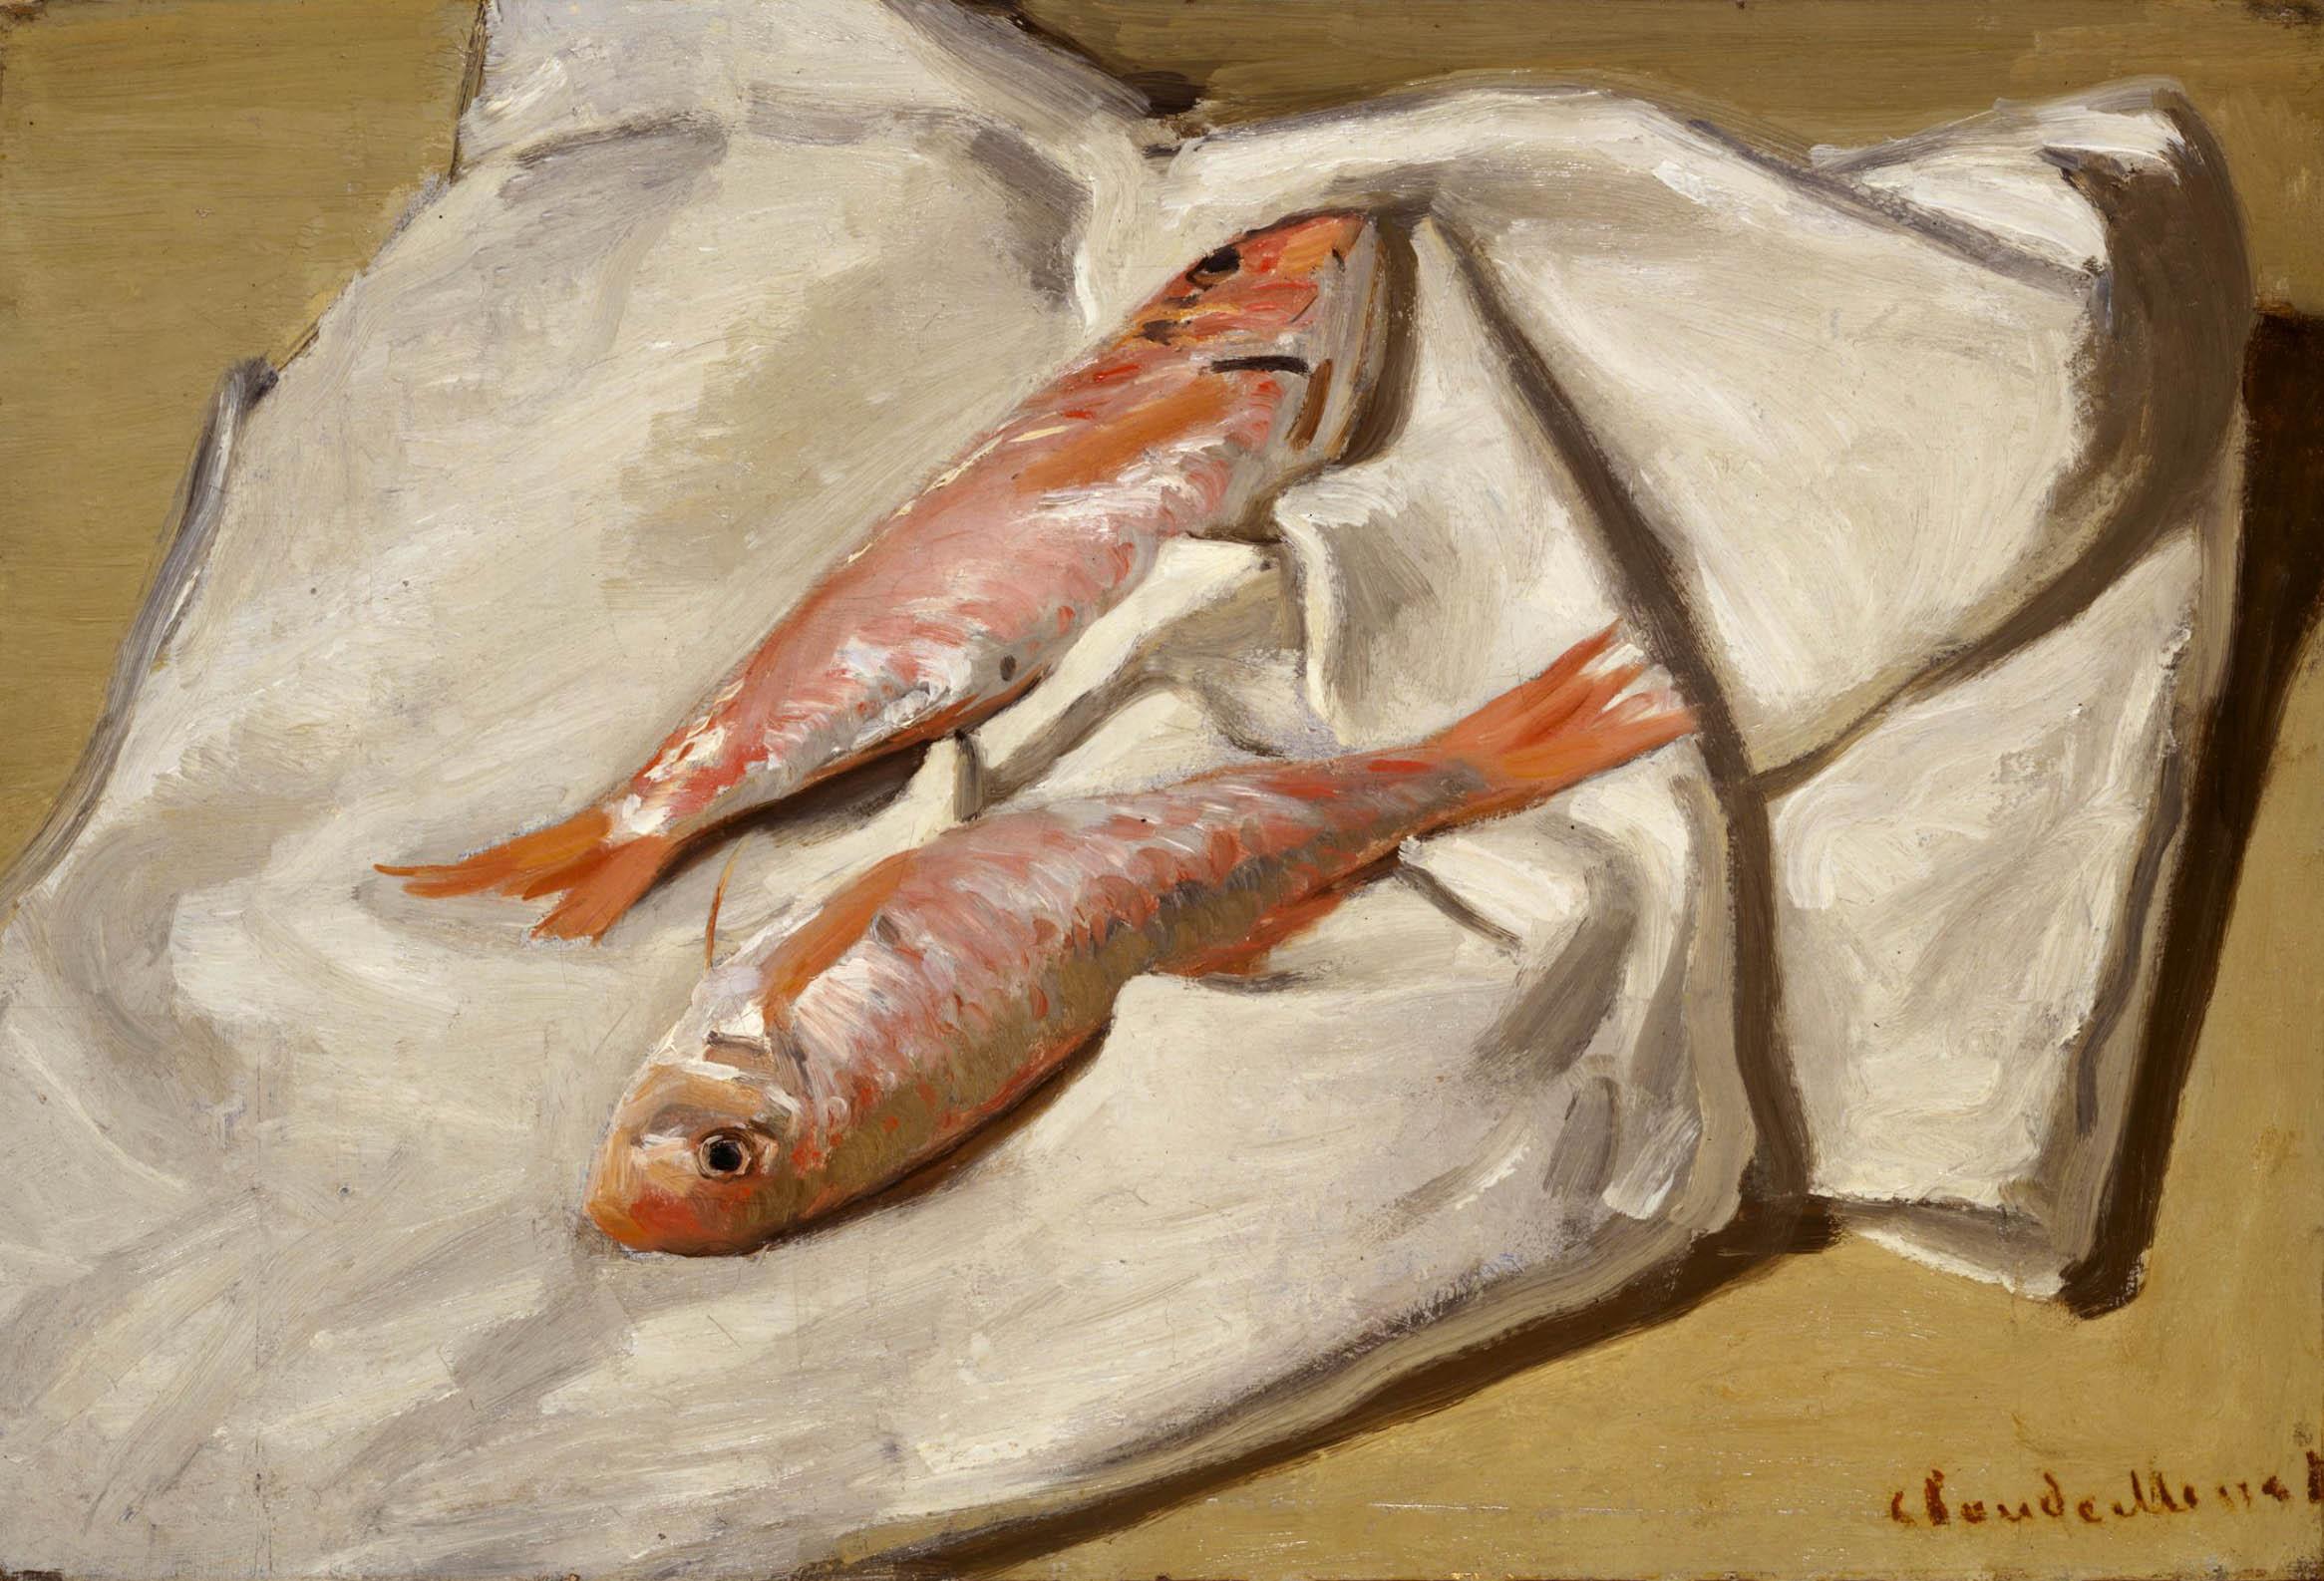 Художник Клод Моне Claude Monet картина Барабулька Red Mullets пейзажи природы Альберт Сафиуллин